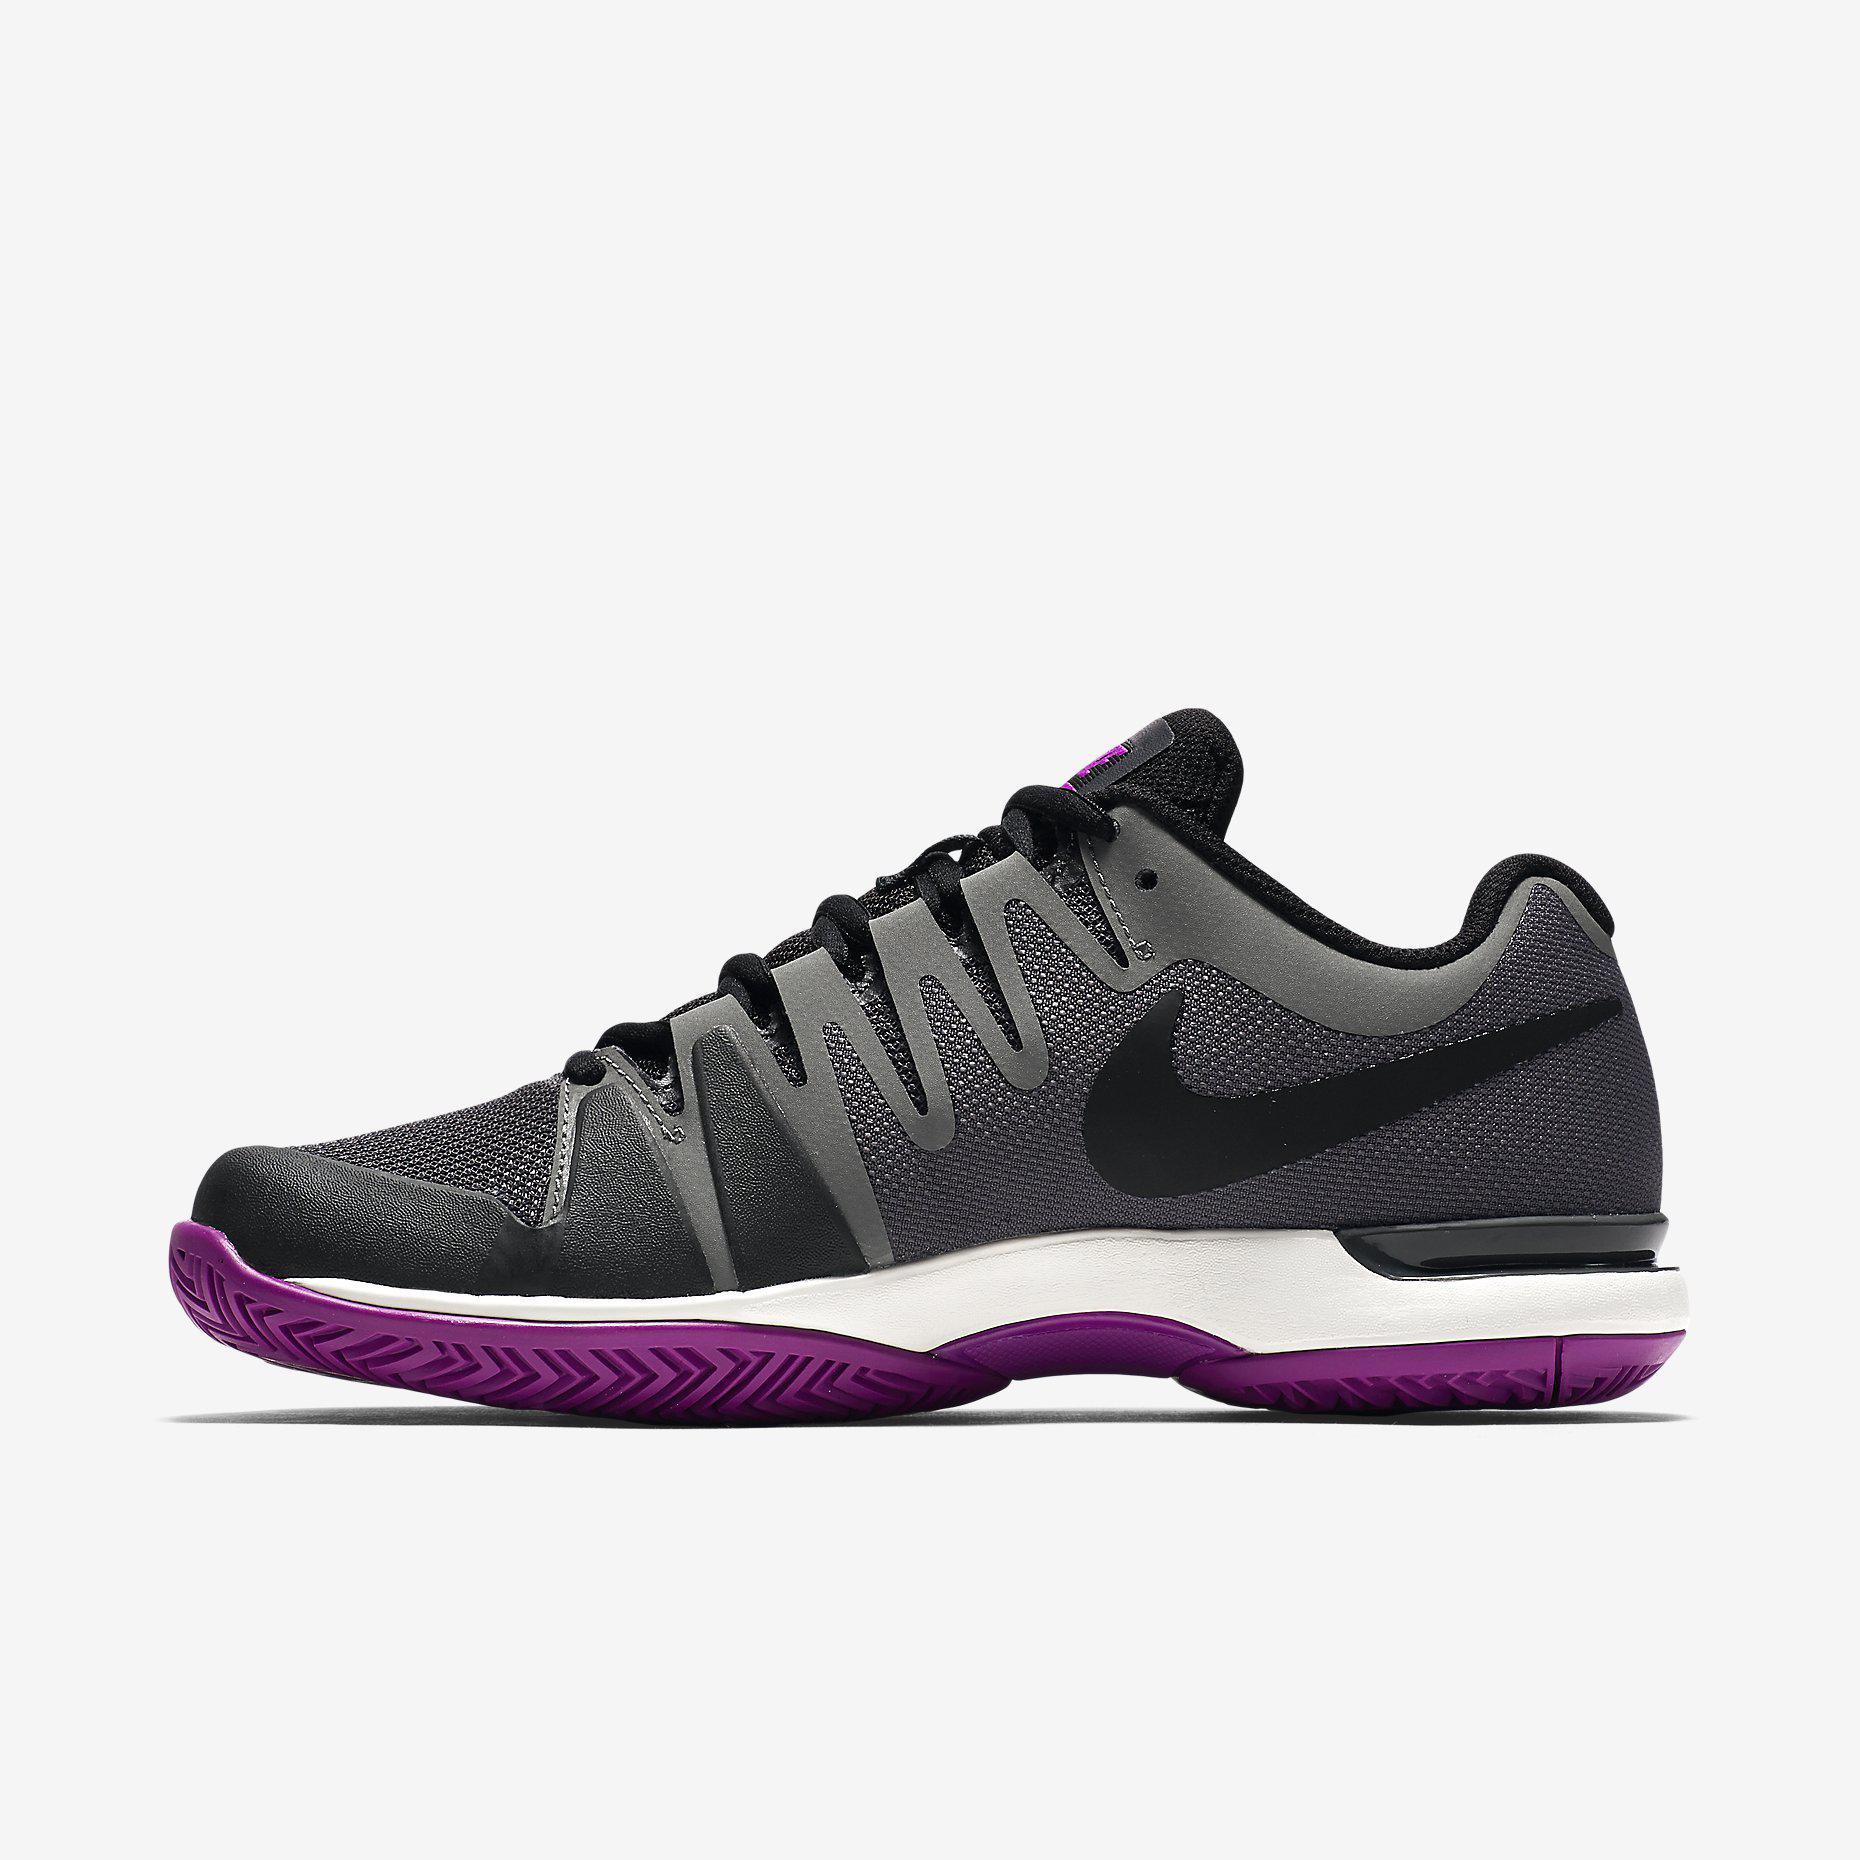 Awesome Nike Air Max Cage Grey Purple Womens Tennis Shoes - Style Guru Fashion Glitz Glamour Style ...